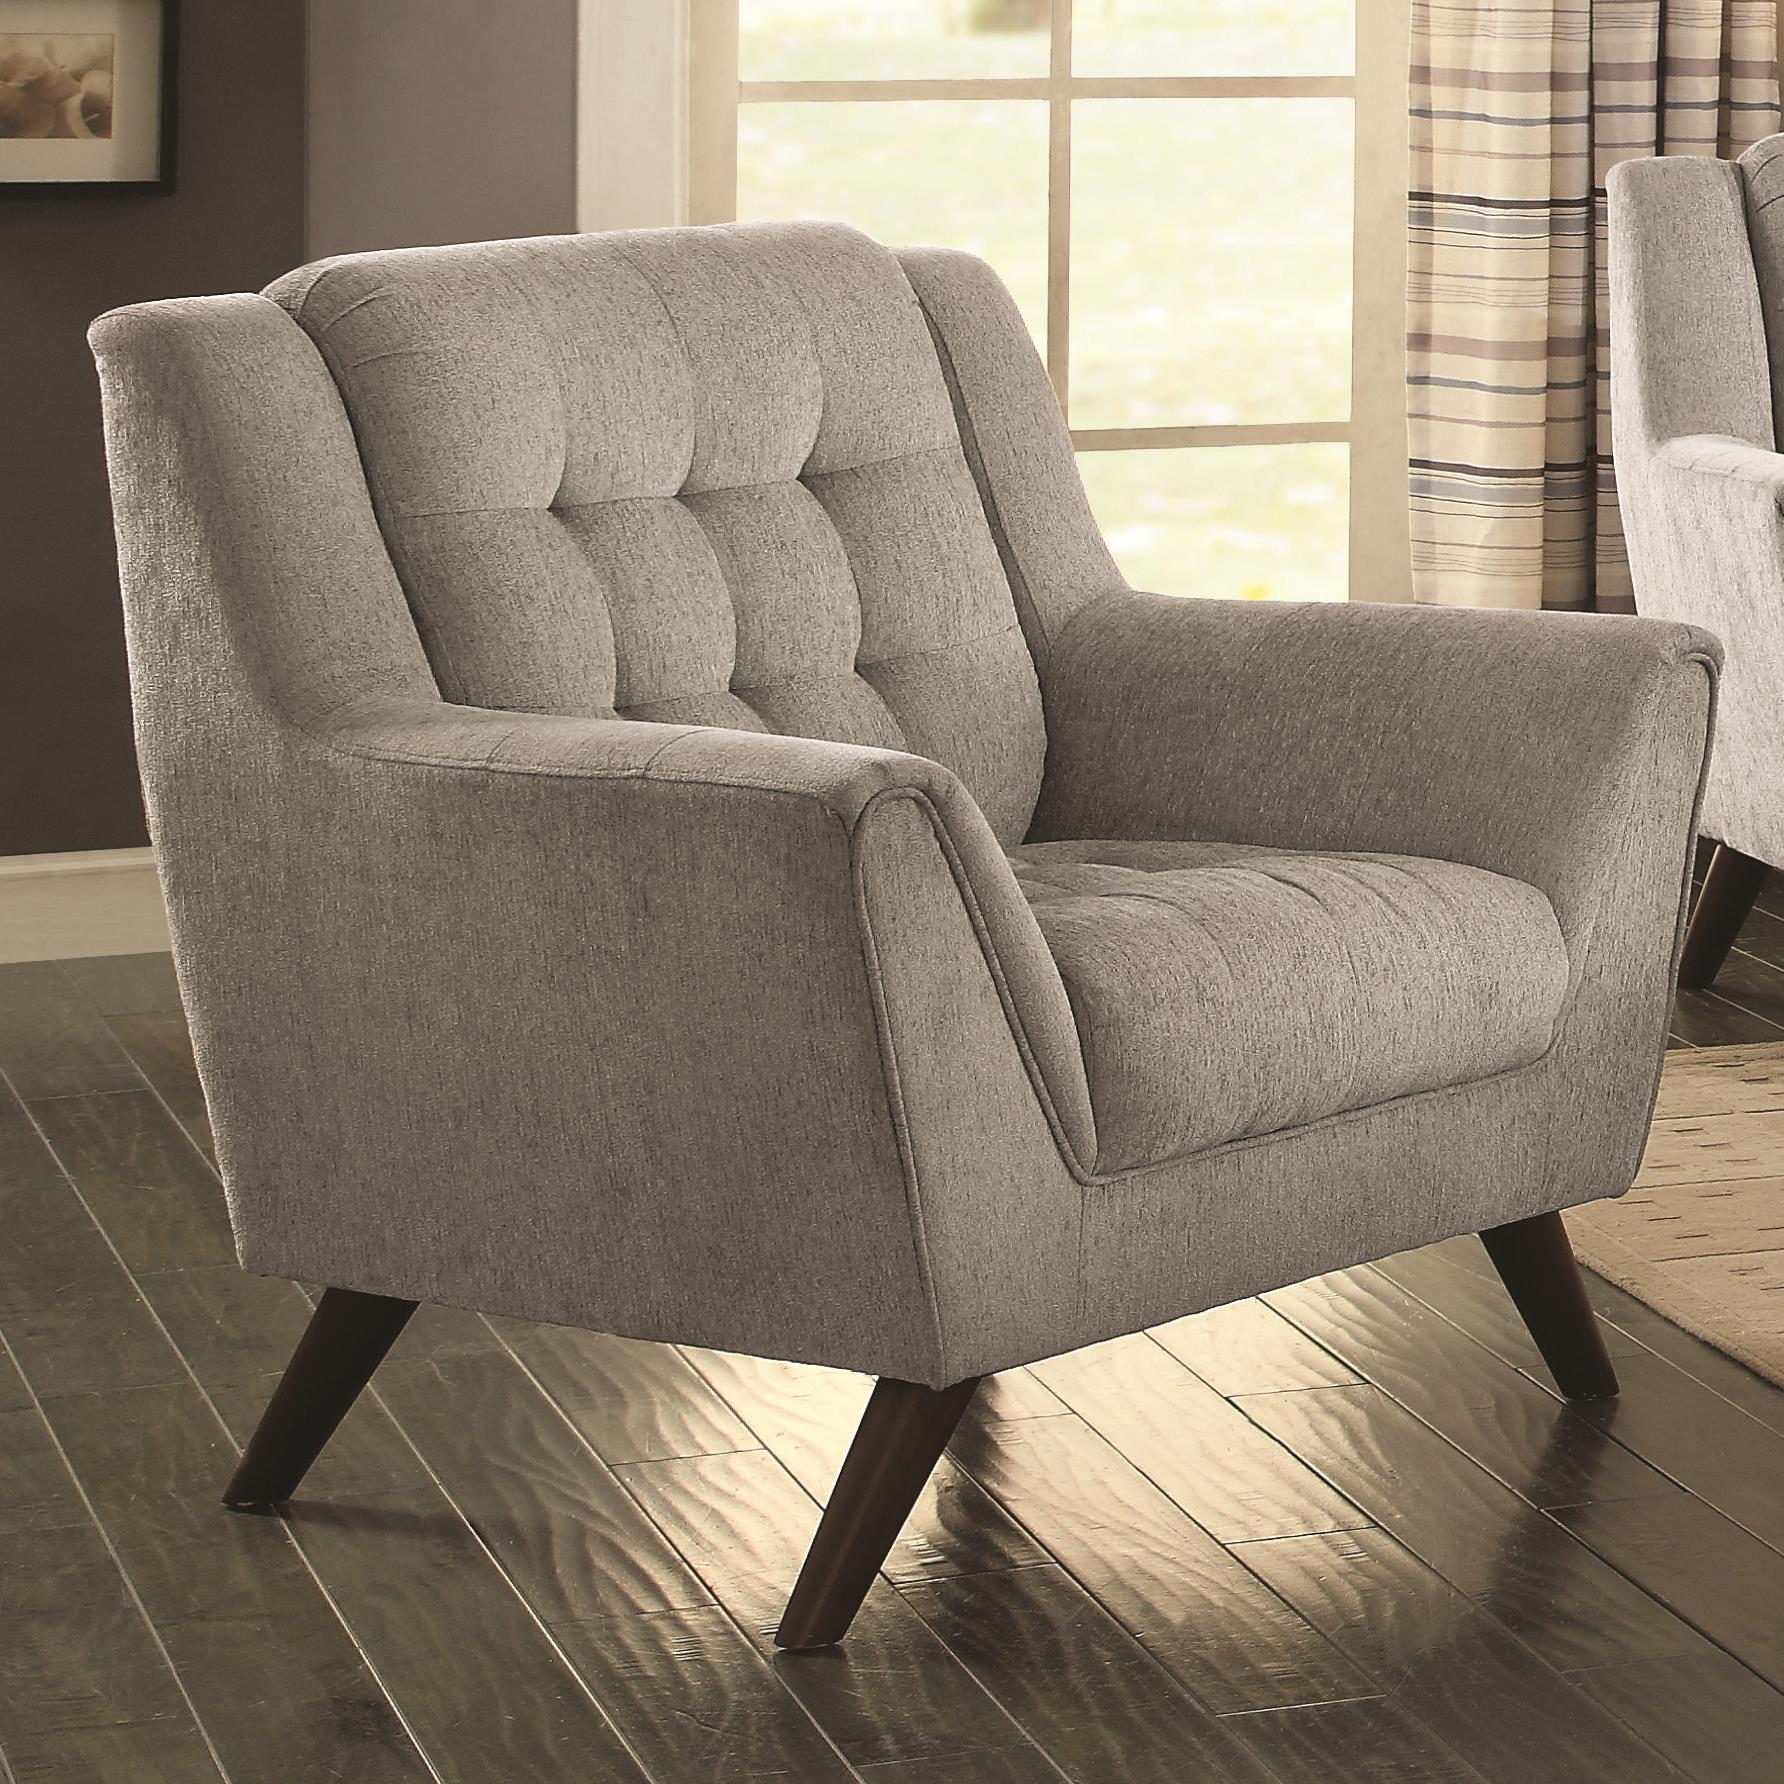 baby furniture chair revolving tyre coaster natalia 511033 mid century modern del